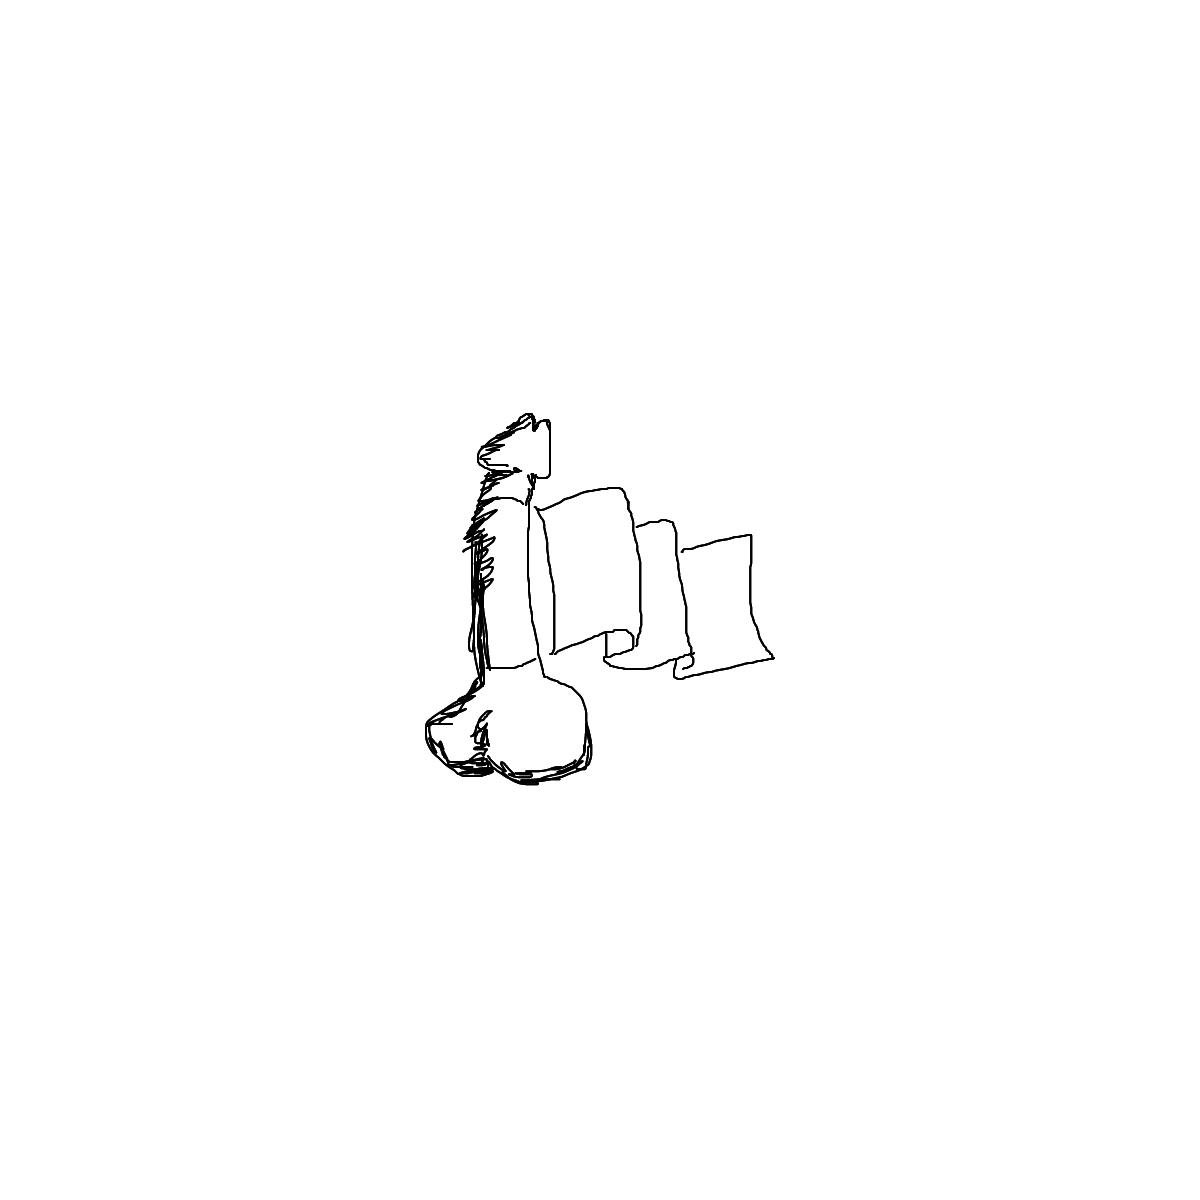 BAAAM drawing#24609 lat:51.5073776245117200lng: -0.1276893615722656